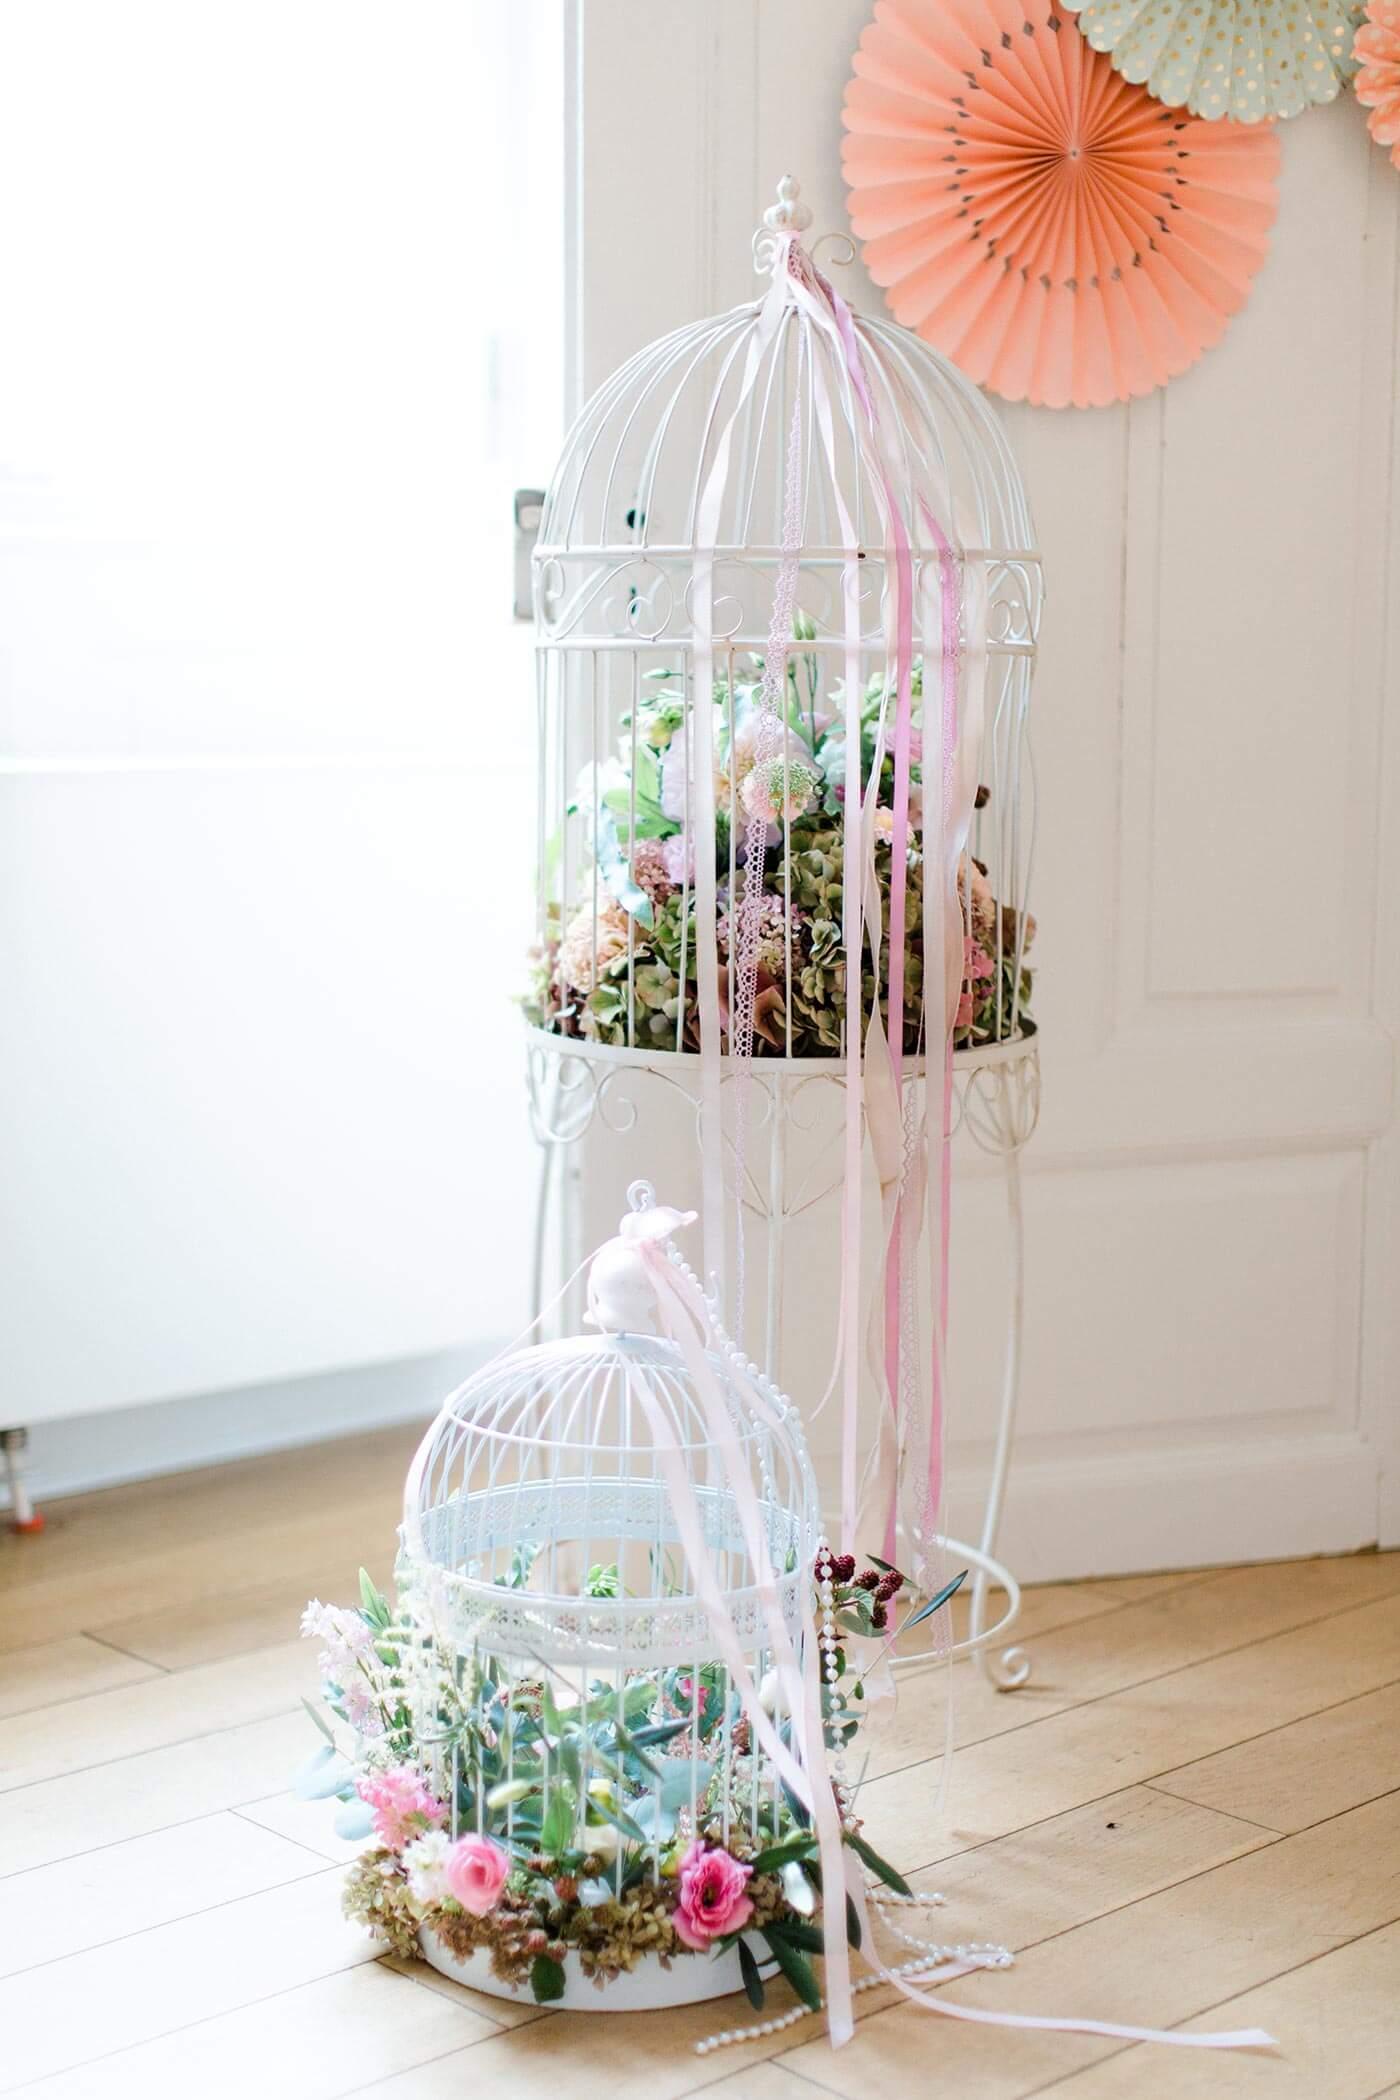 deko mit vogelk fig i zauberhafte ideen in der galerie. Black Bedroom Furniture Sets. Home Design Ideas